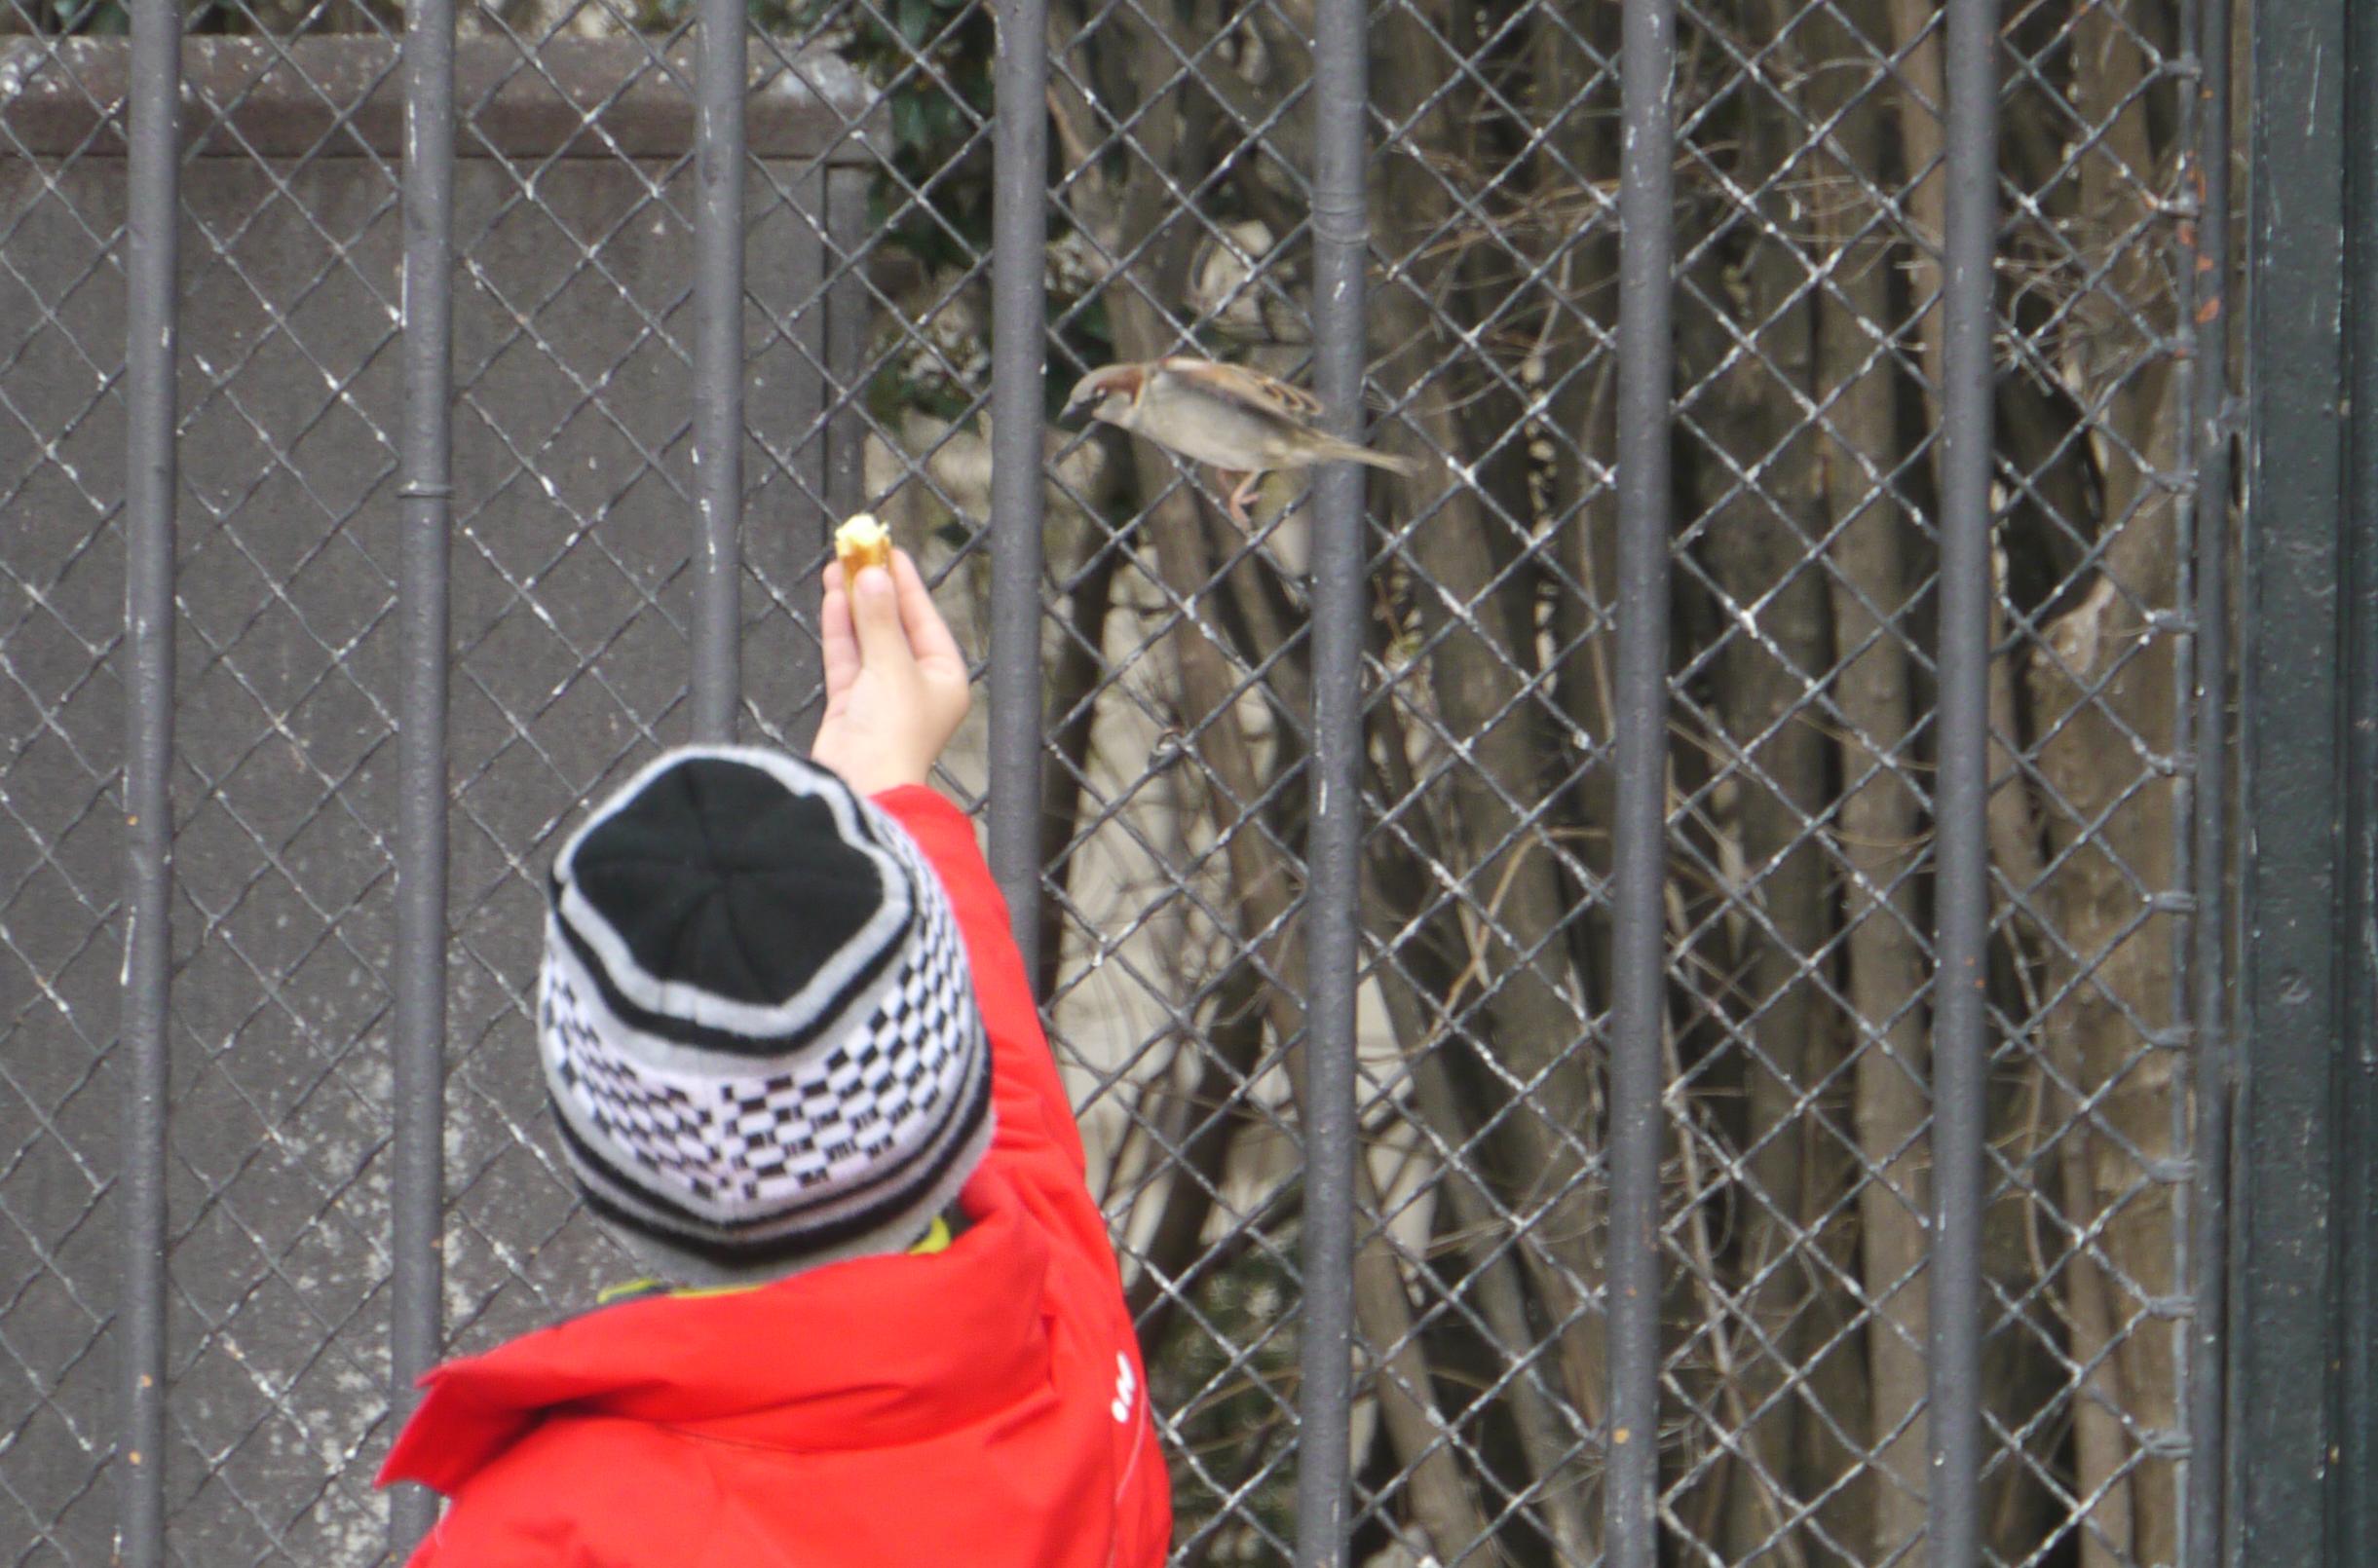 Paris 22 barn matar fågel Notre dam